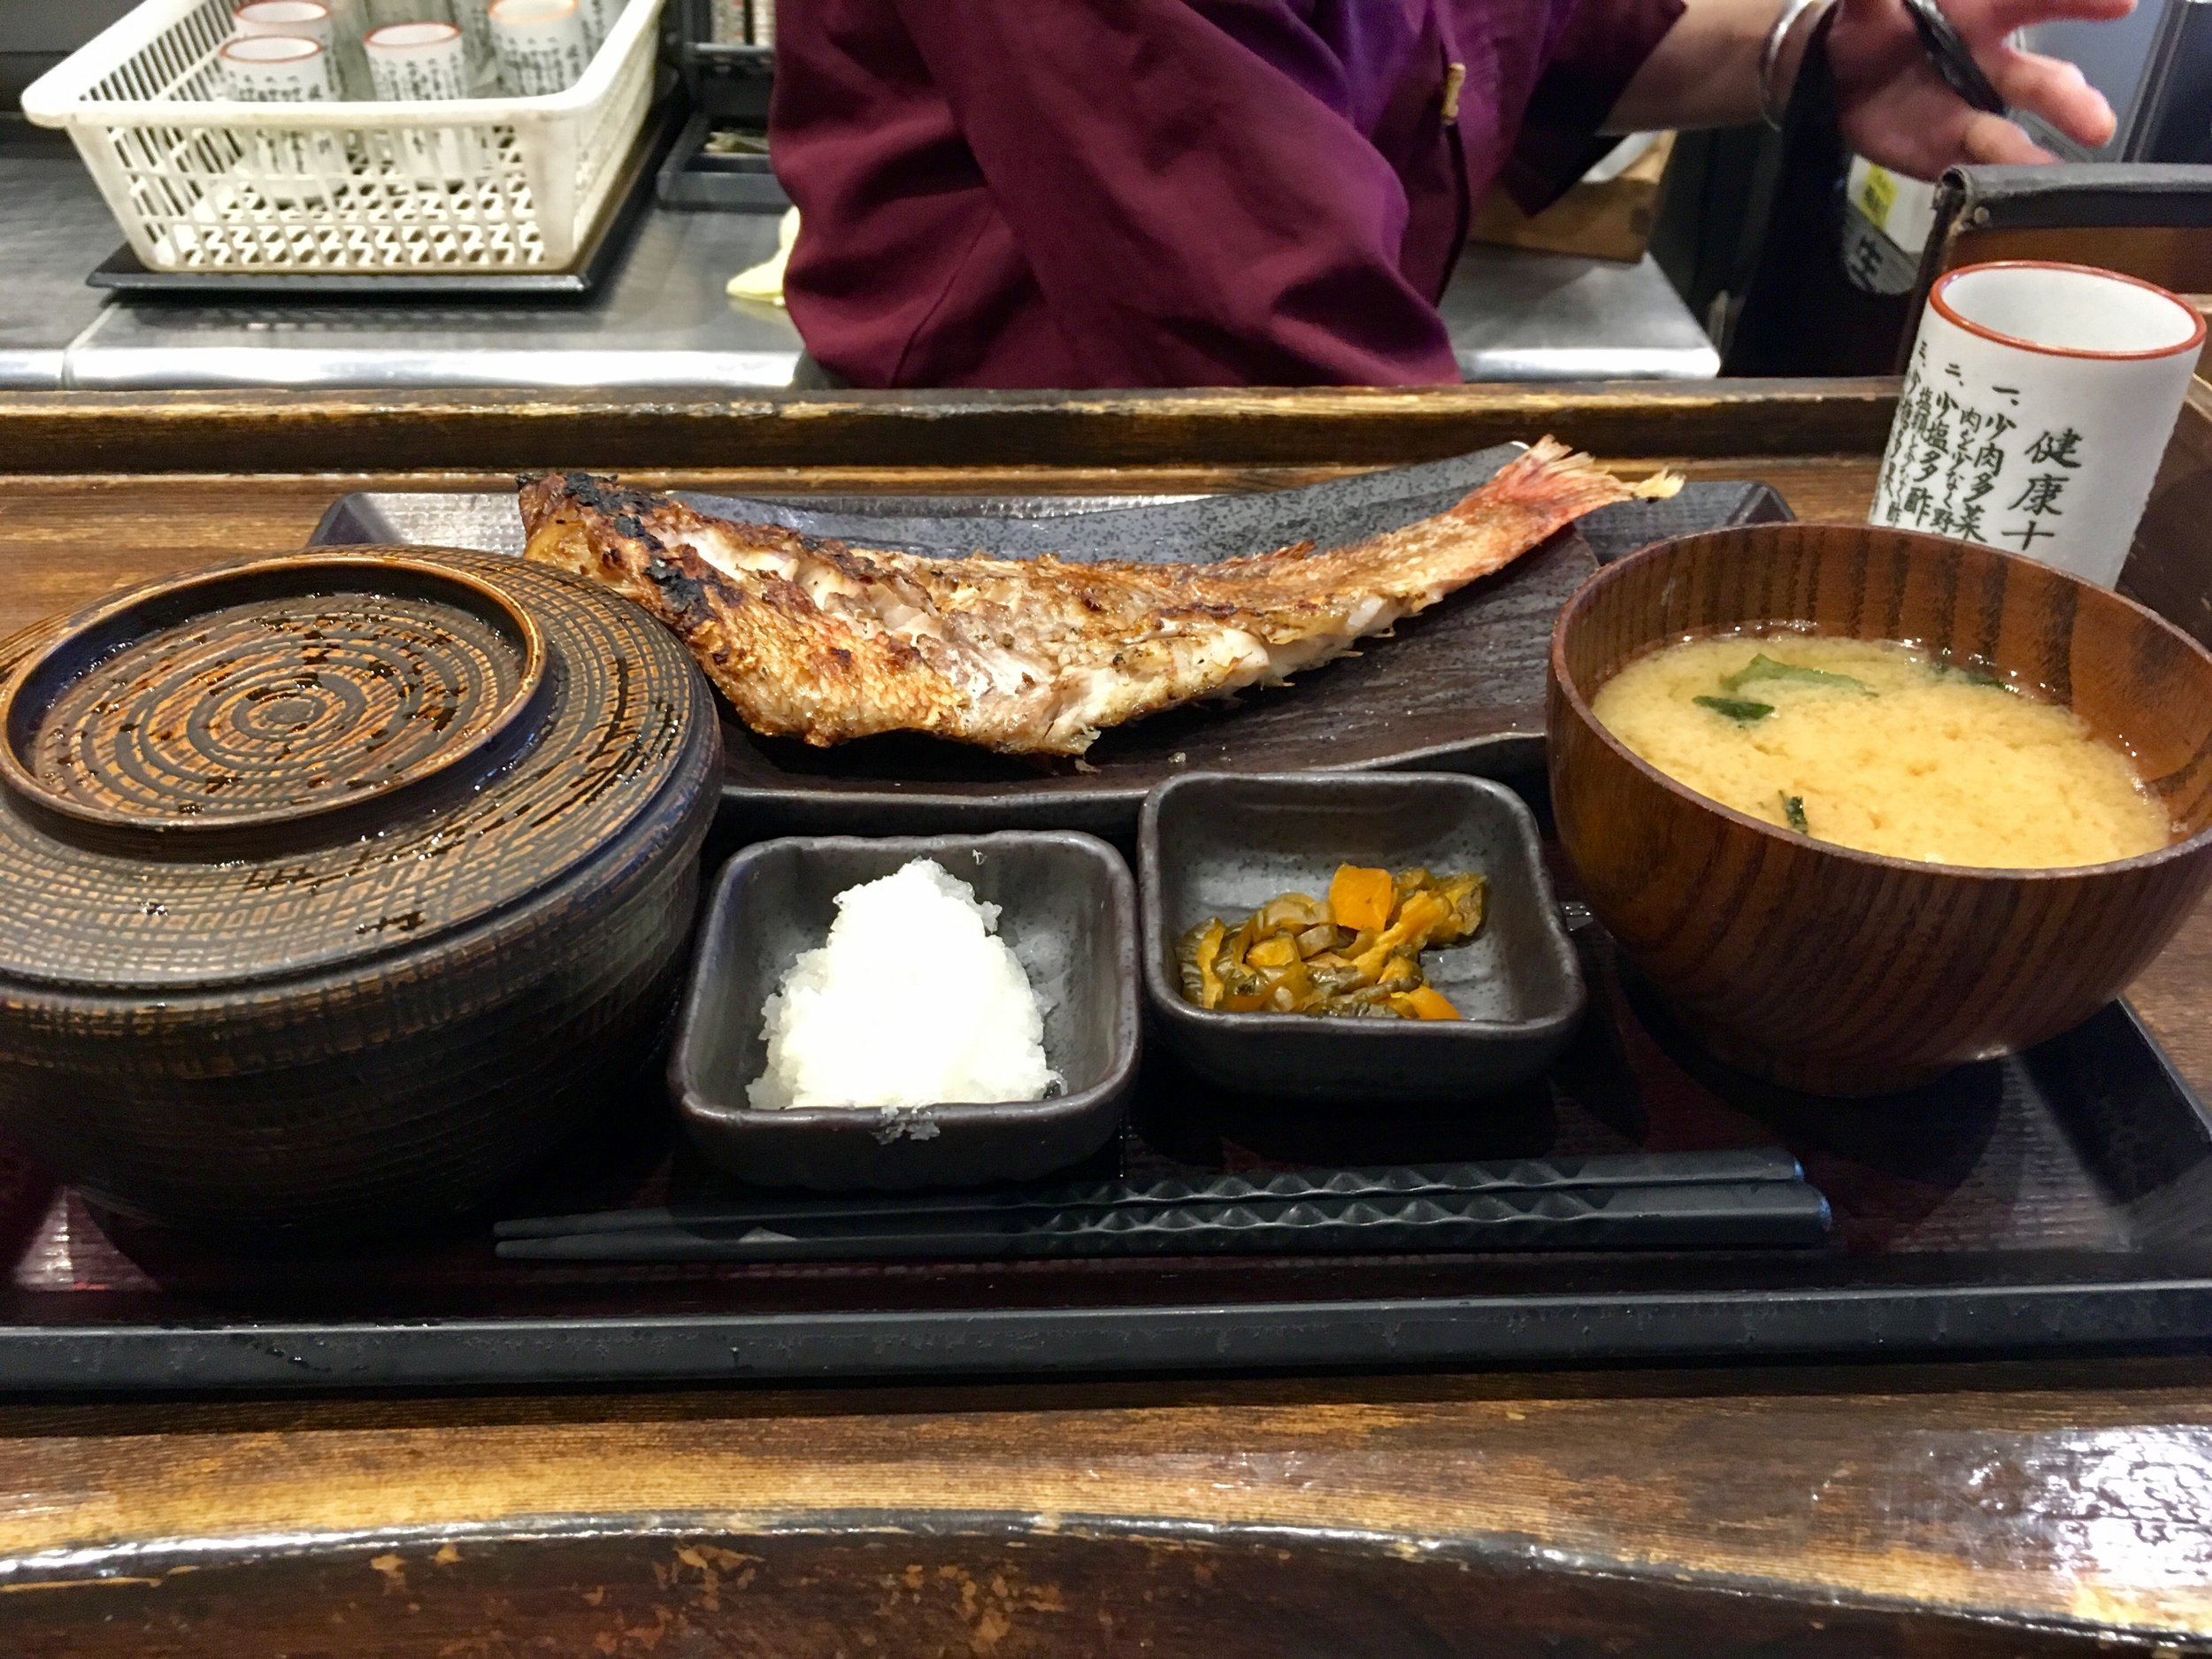 Fish breakfast at Shinpachi Shokudo